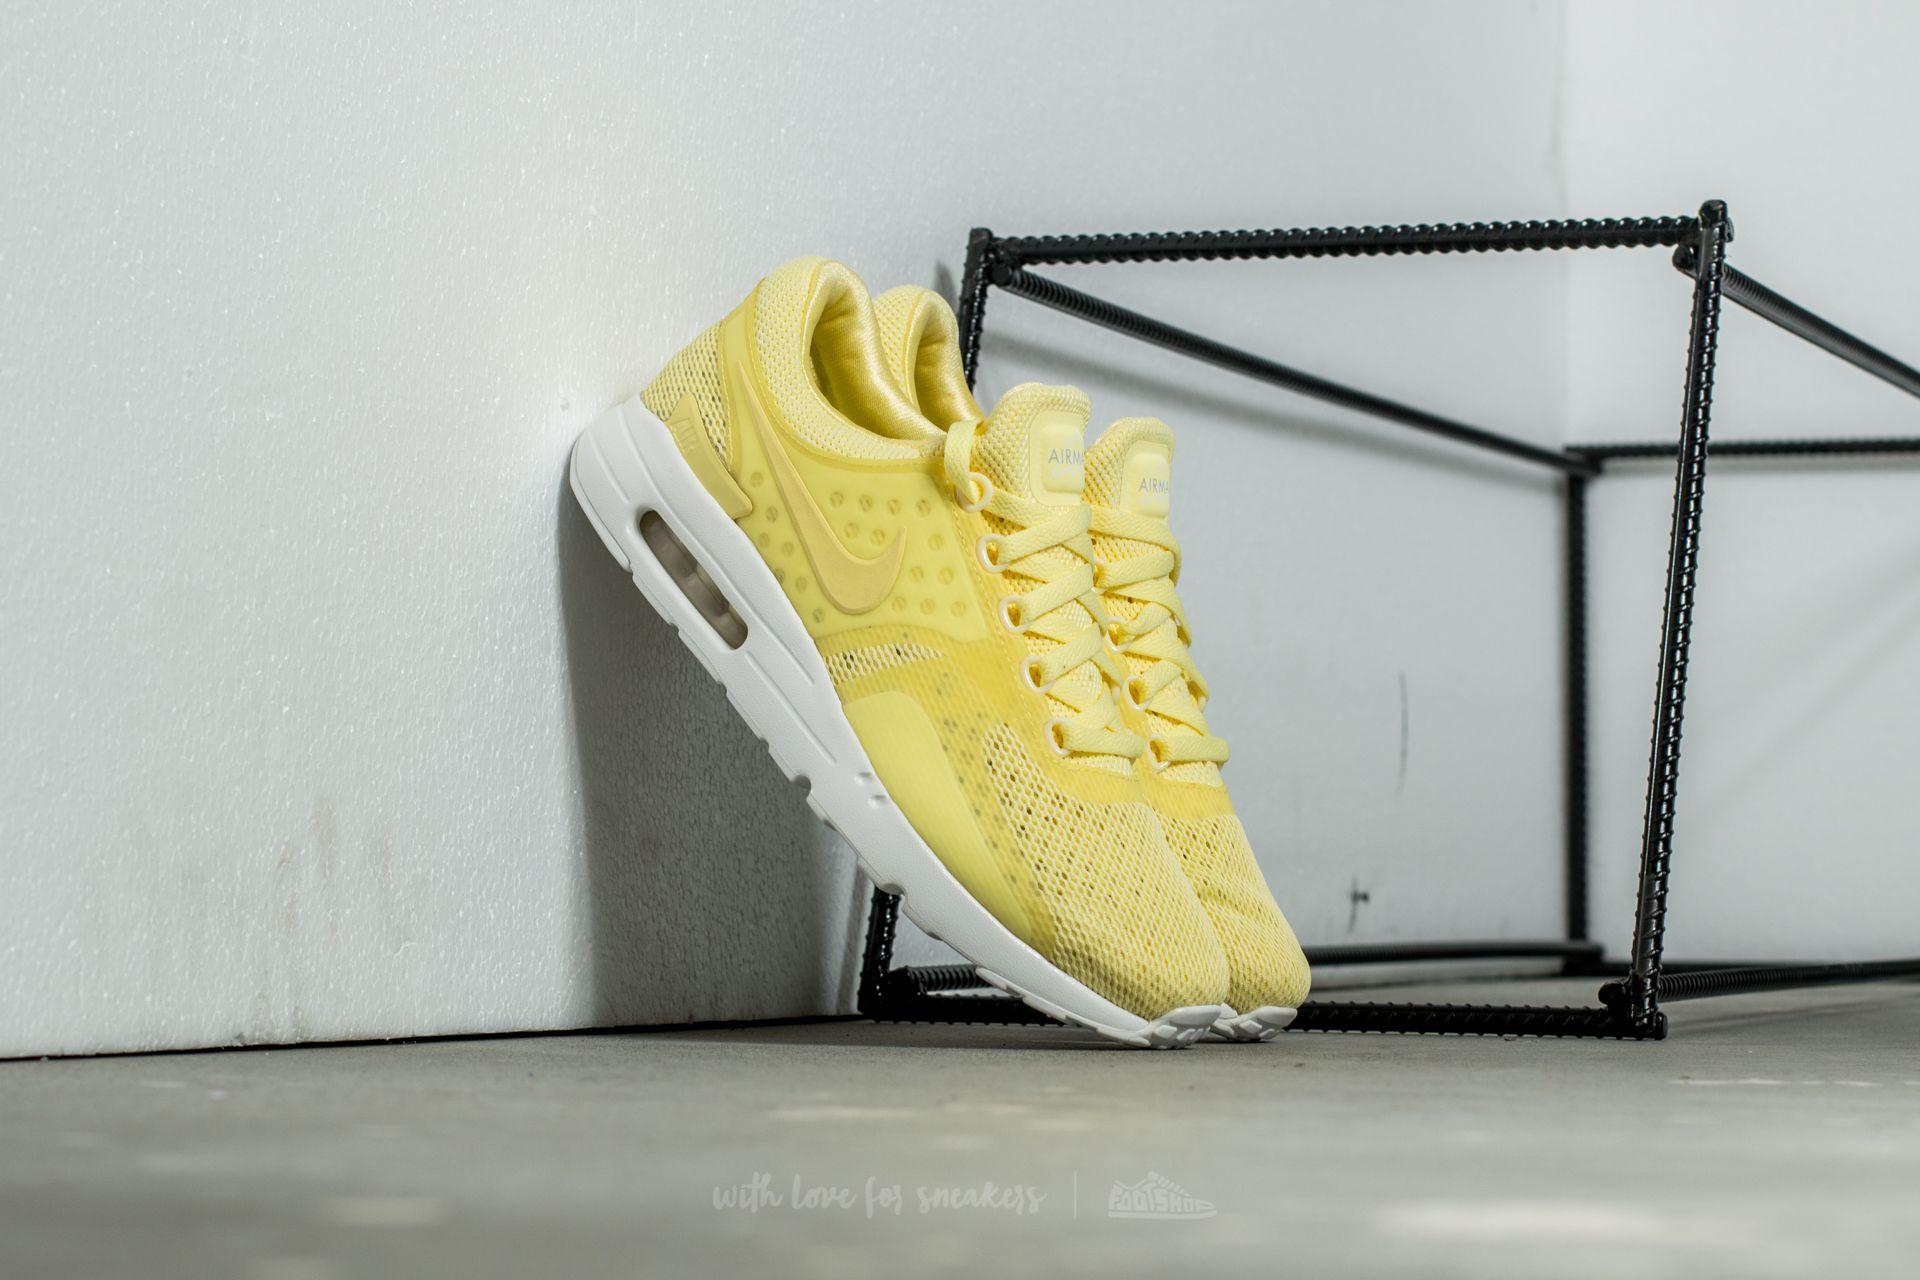 b6c2ecf00da Nike Air Max Zero BR Lemon Chiffon  Lemon Chiffon